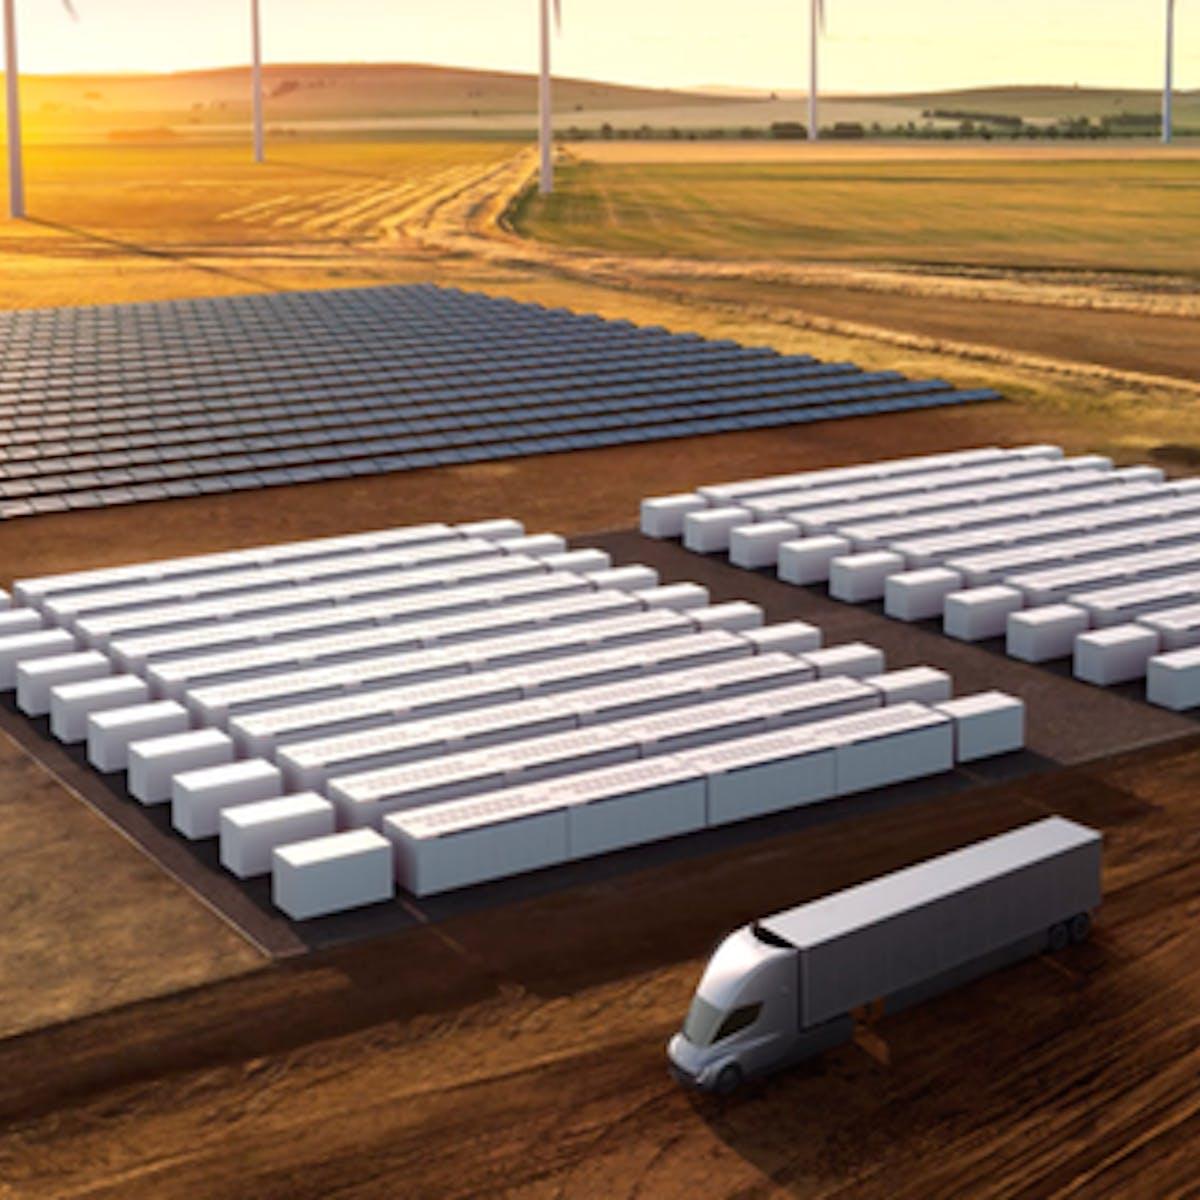 Musk Reads: Tesla Solar Steps Into the Sun